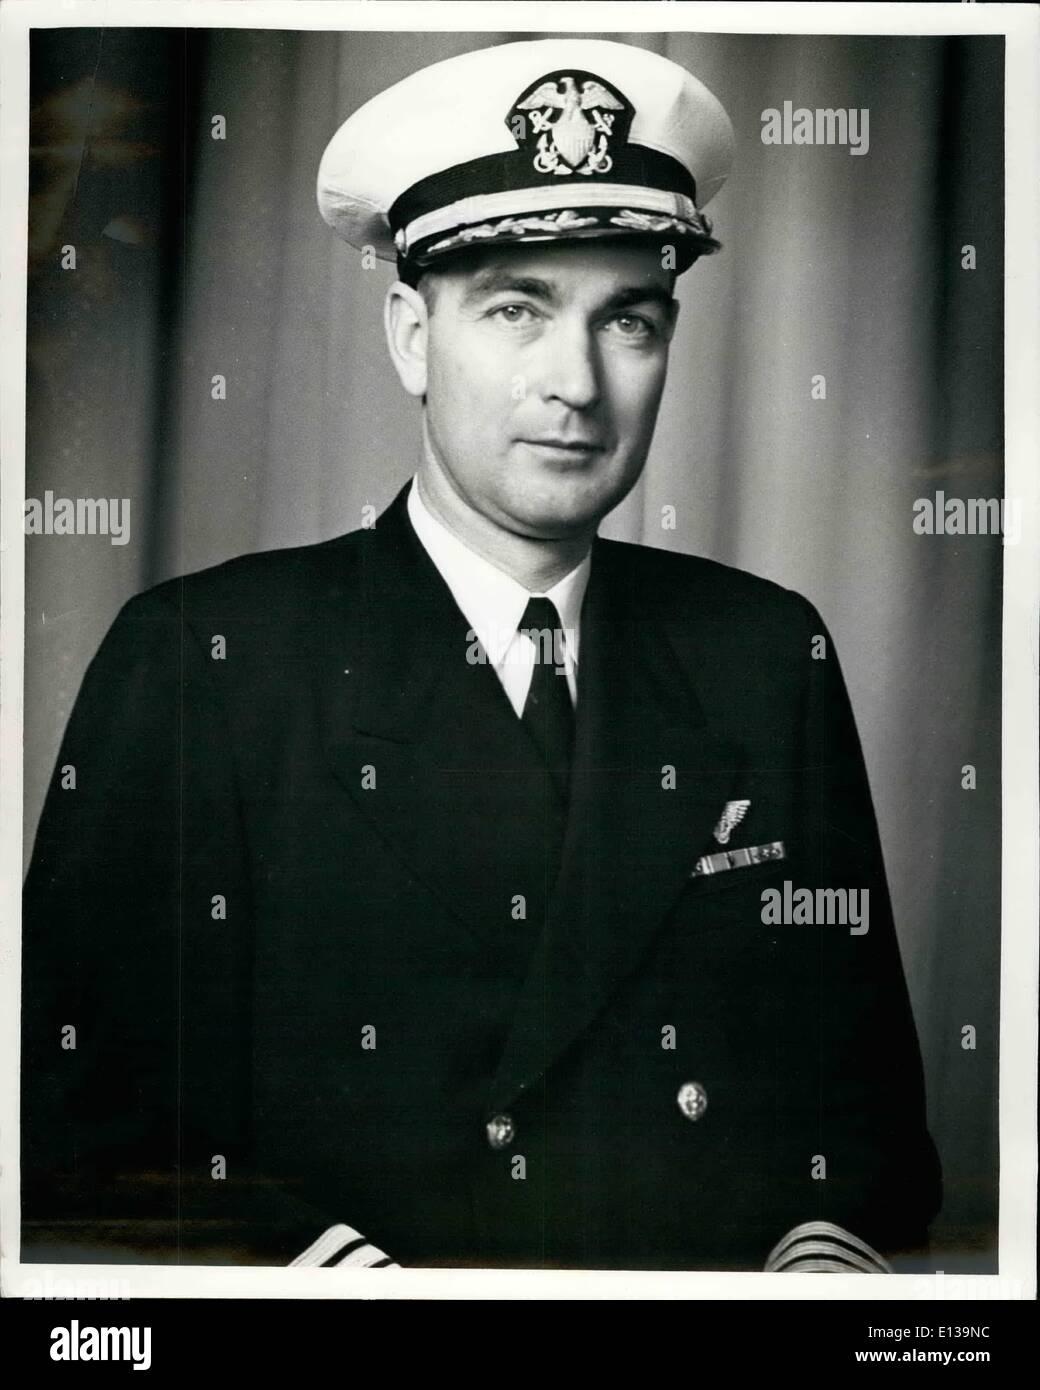 Feb. 29, 2012 - CDR. Damon W. Colper, USN. - Stock Image